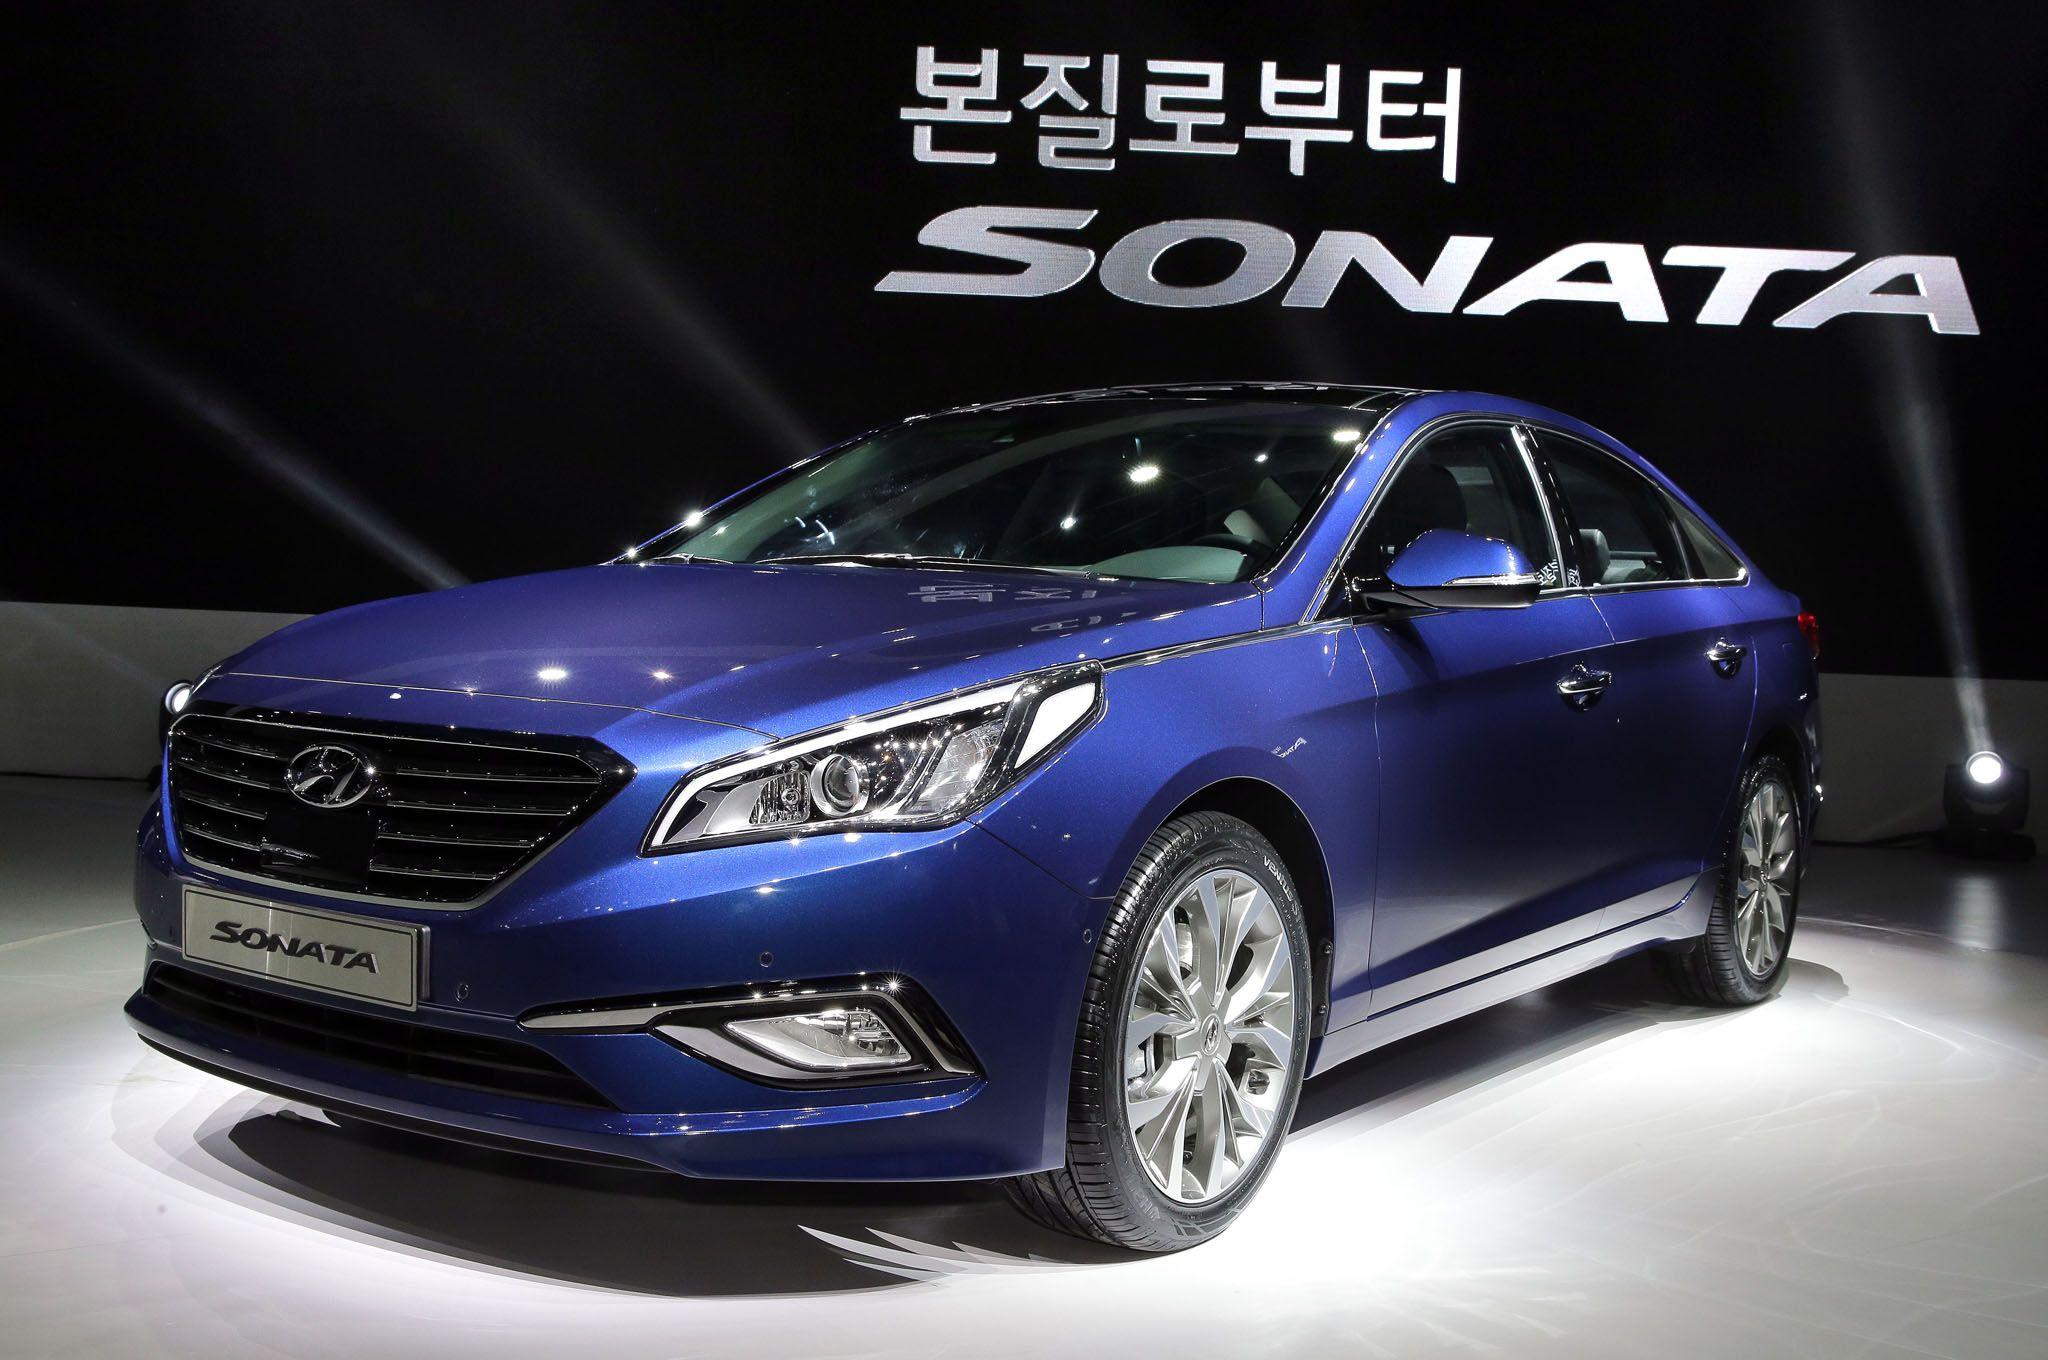 2015 hyundai sonata front design